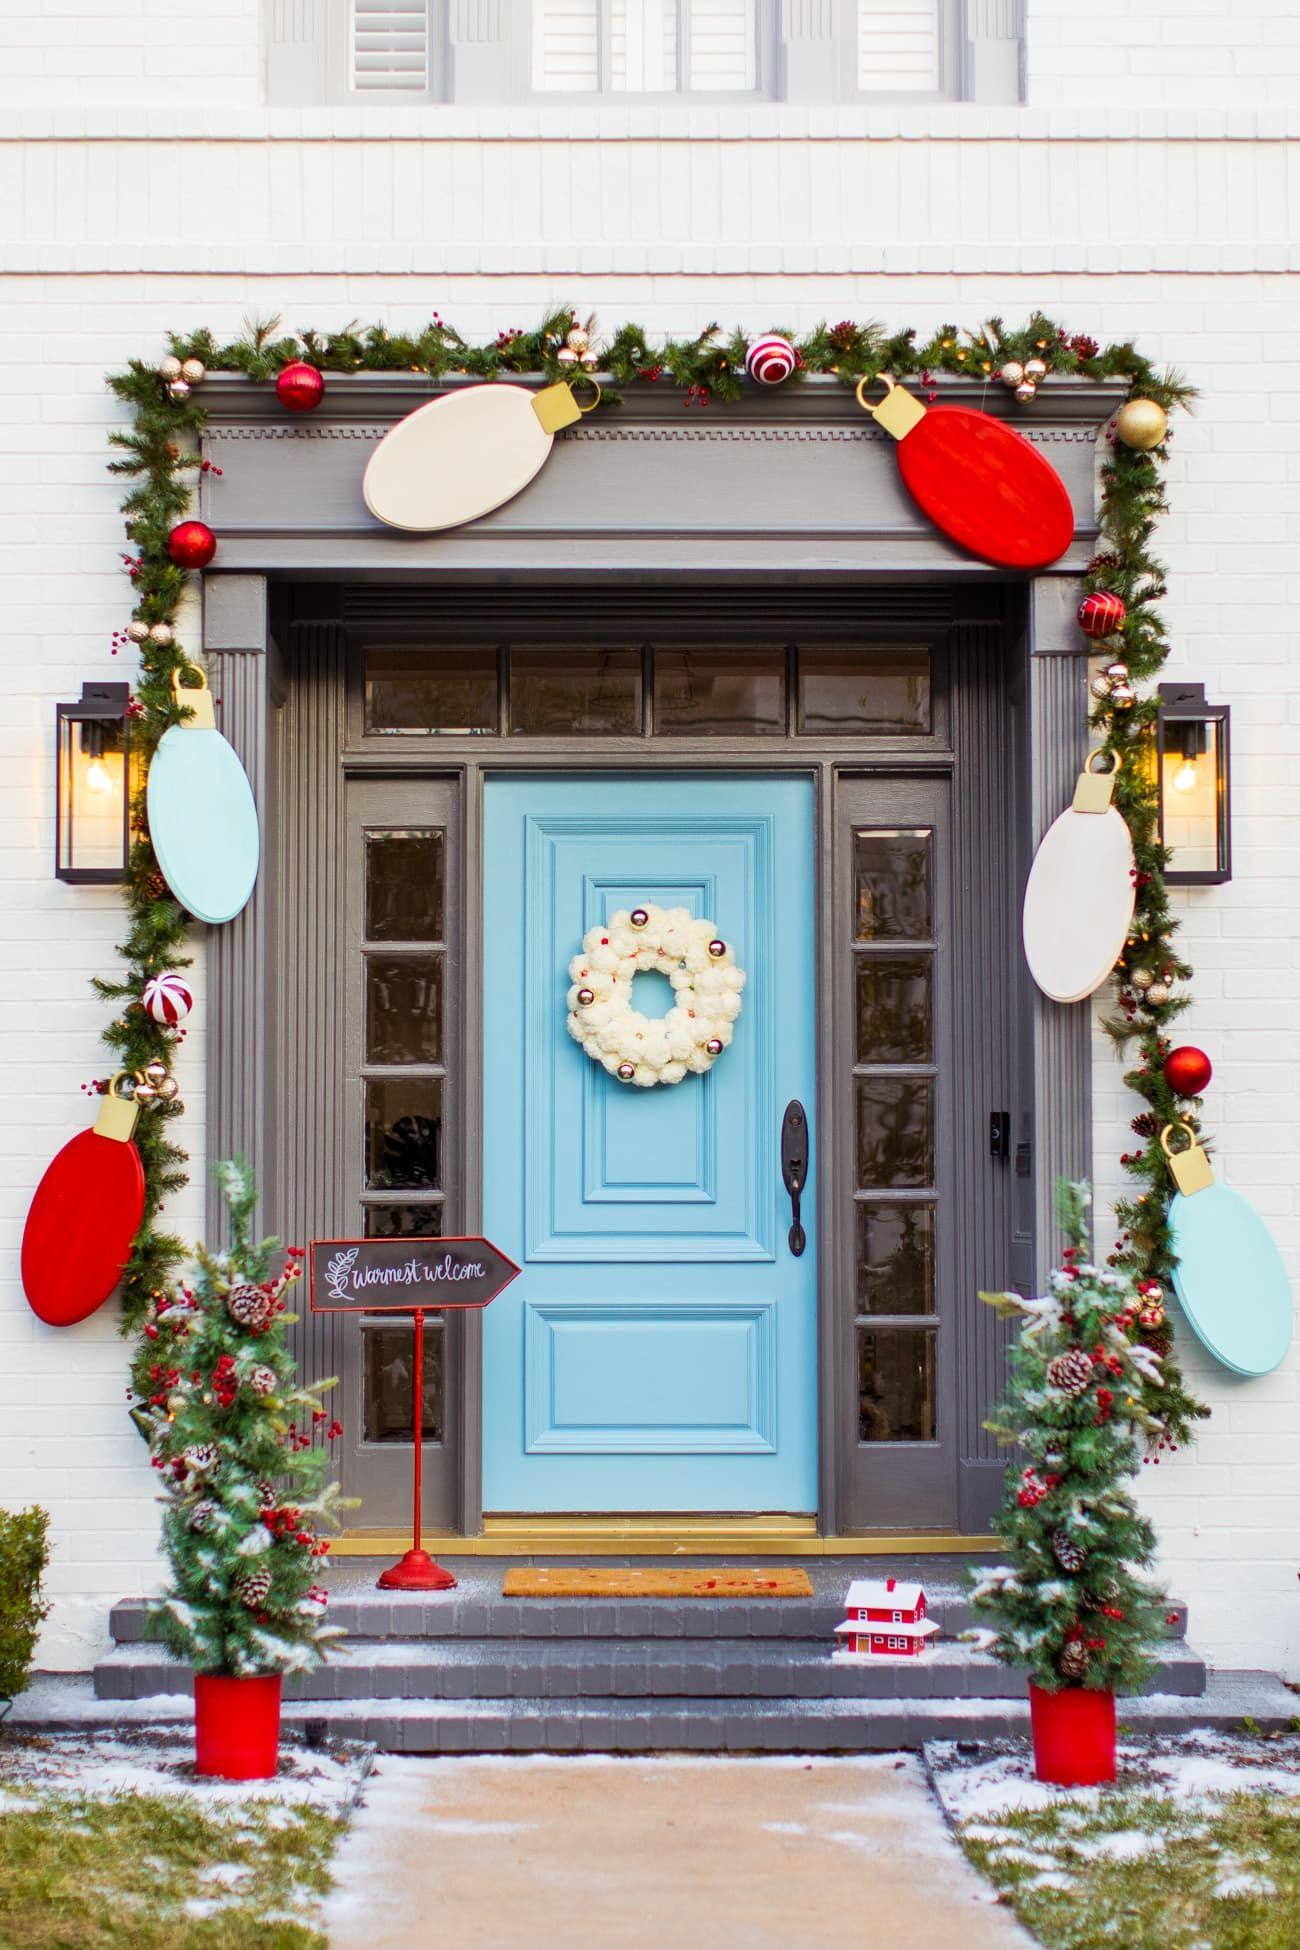 Elegant Handmade Christmas Ornaments.30 Easy Diy Christmas Decorations Homemade Holiday Decor Ideas